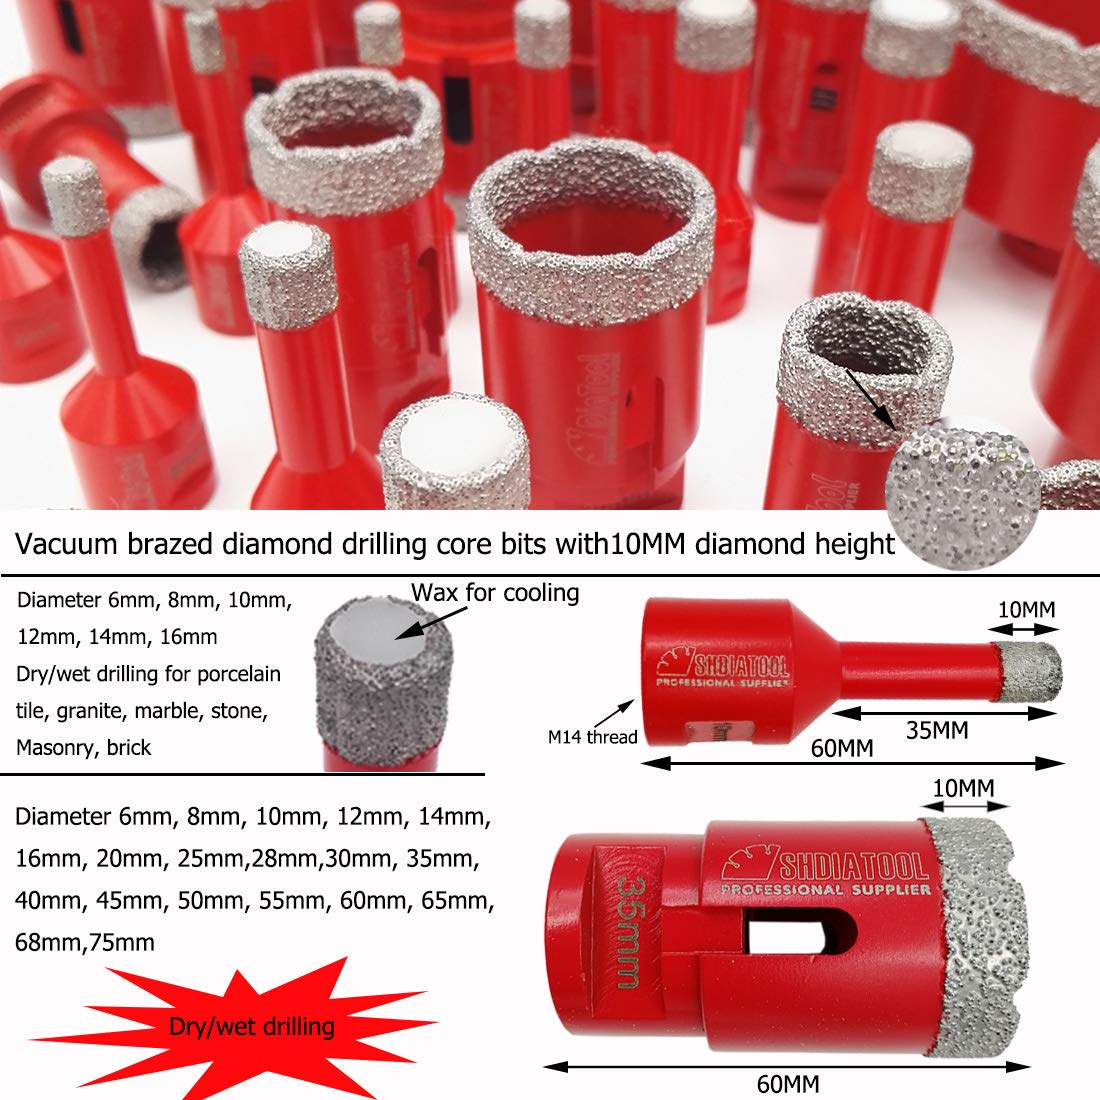 1pc Diamond Core Bits Hole Saw Drilling Bits M14 Thread for Ceramic Tile Marble